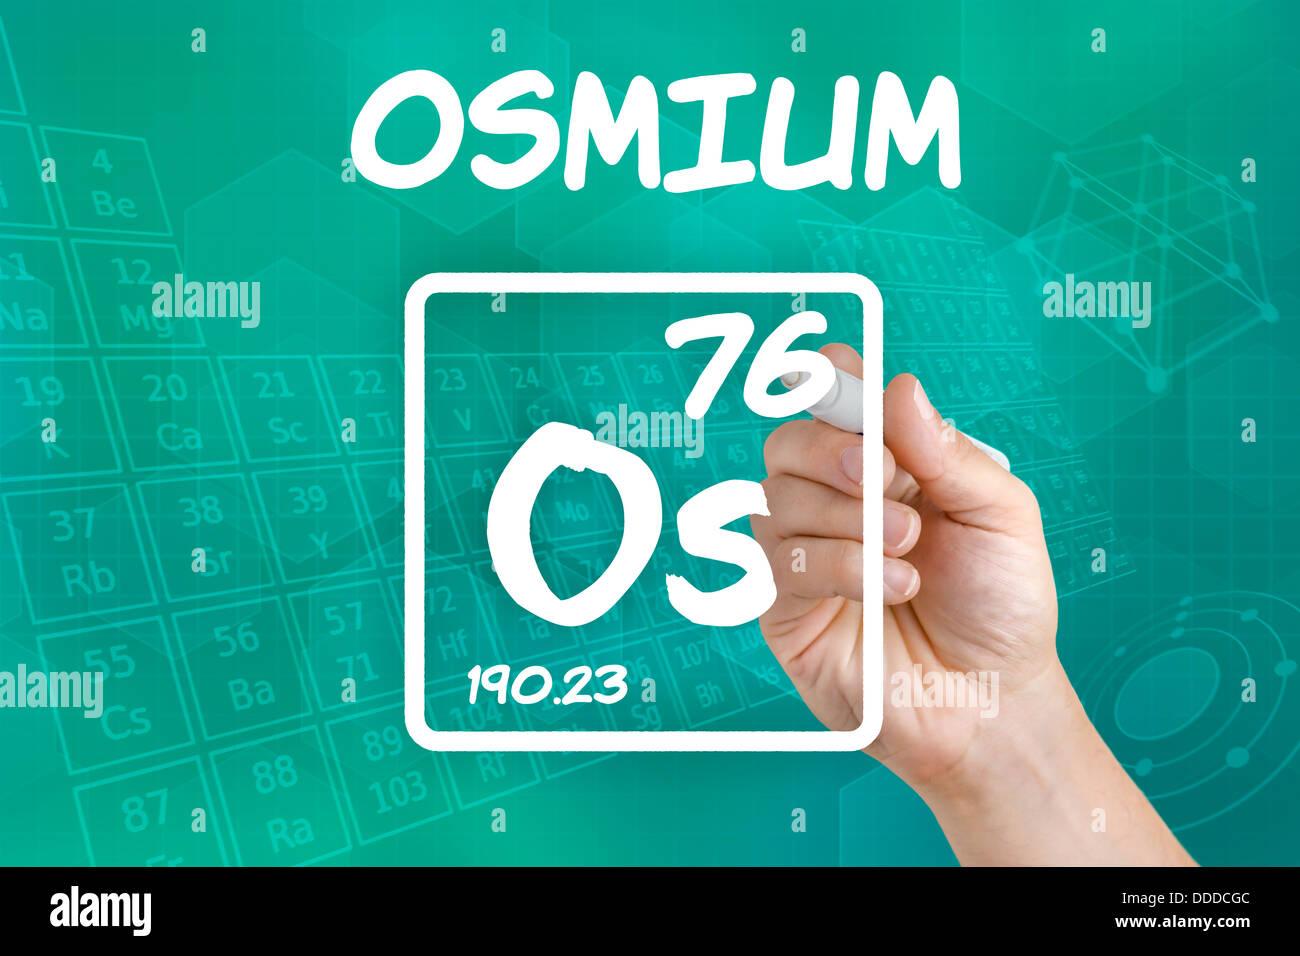 Symbol for the chemical element osmium stock photo 59916876 alamy symbol for the chemical element osmium urtaz Images